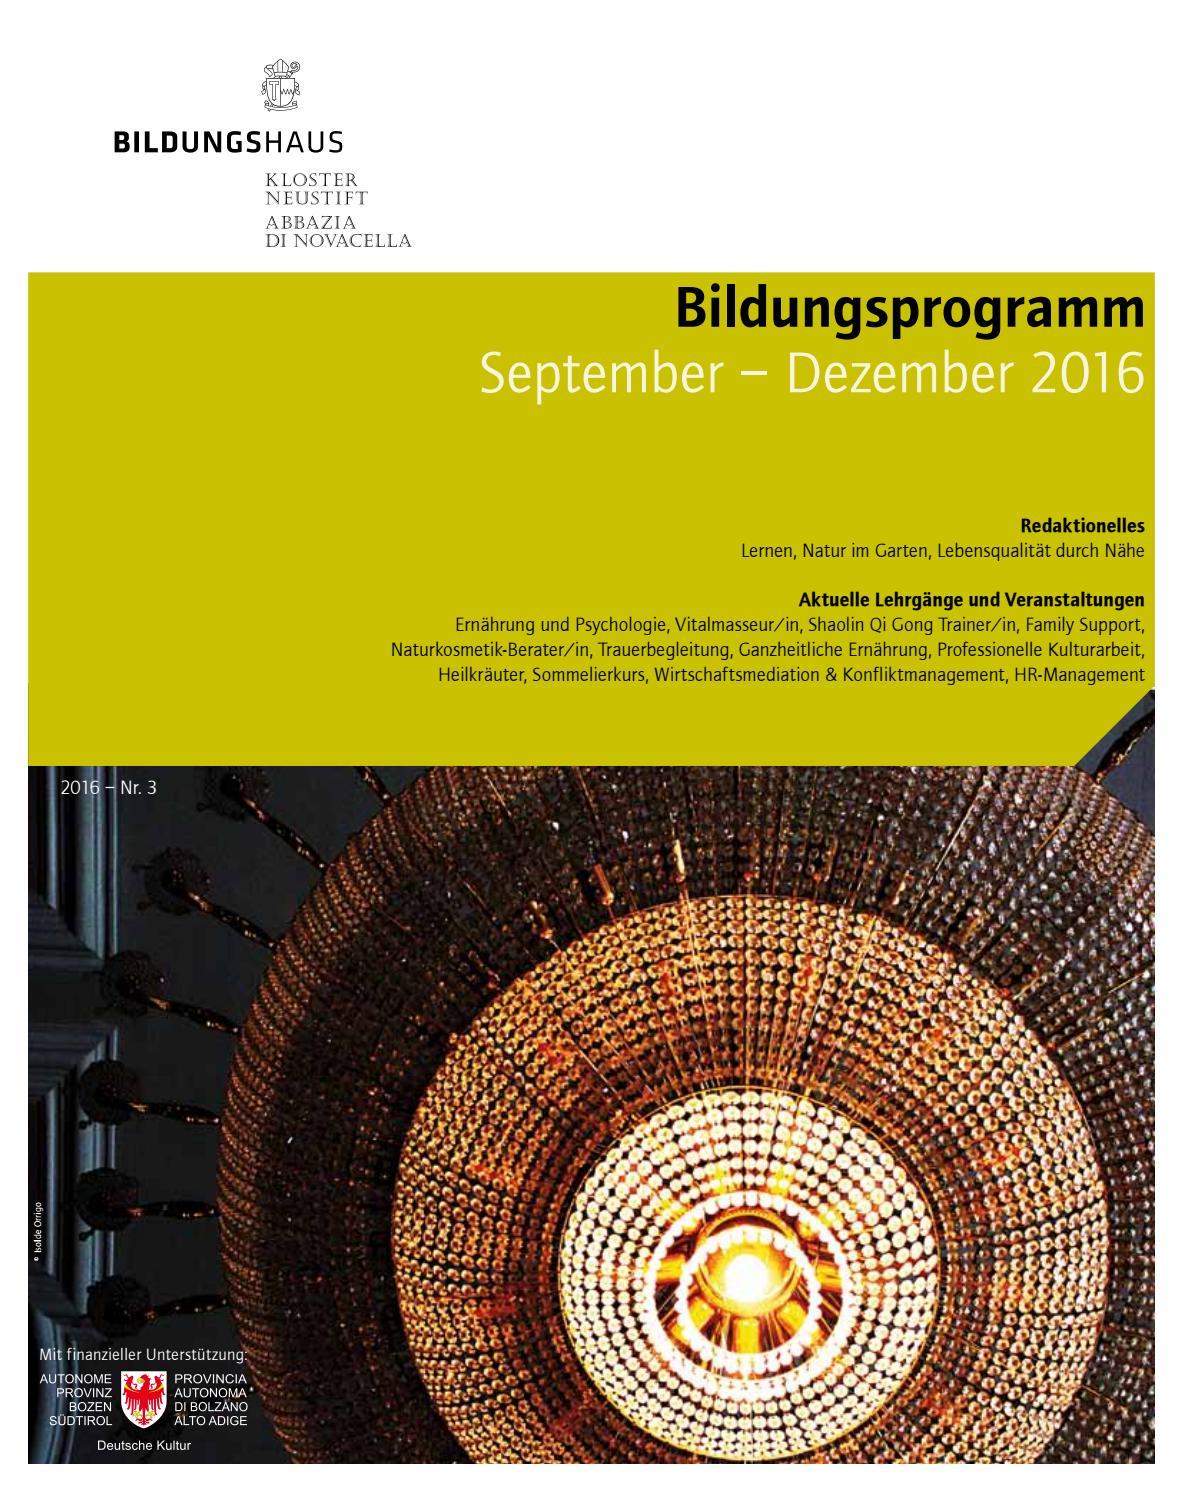 Bildungsprogramm September - Dezember 2016 by Bildungshaus Kloster ...